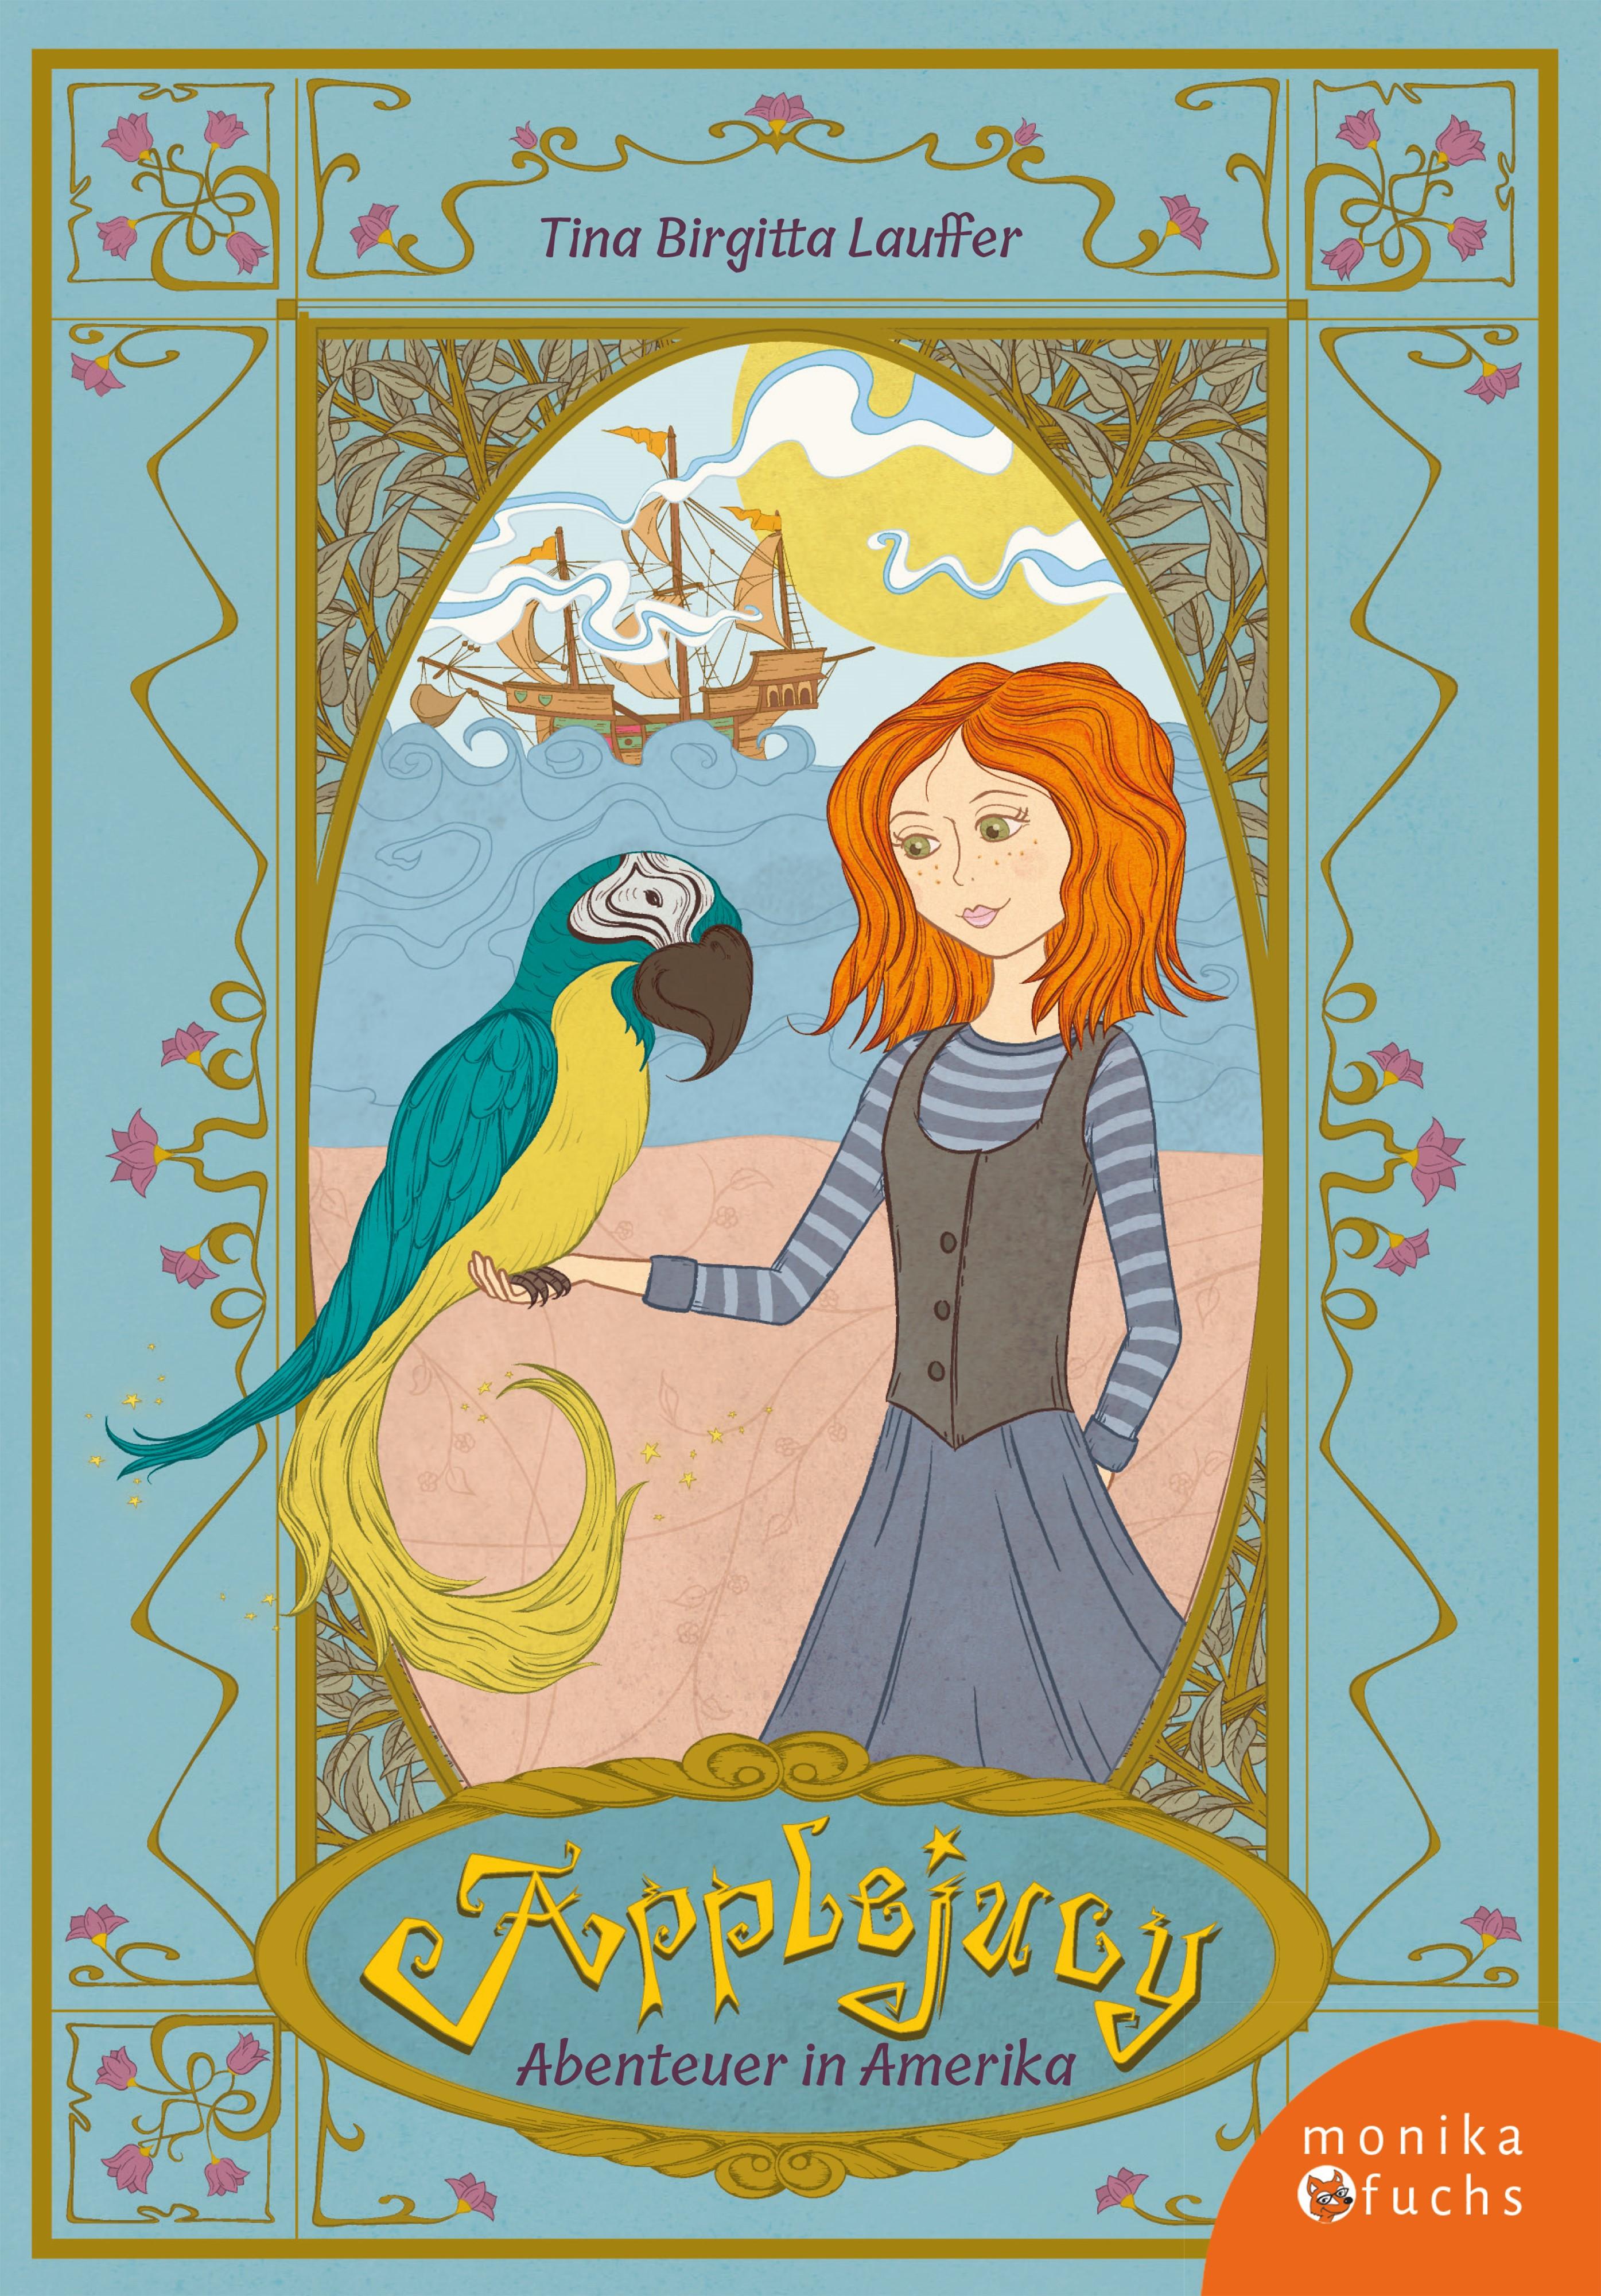 Tijo Kinderbuch & Kindertheater - Tina Birgitta Lauffer - Applejucy